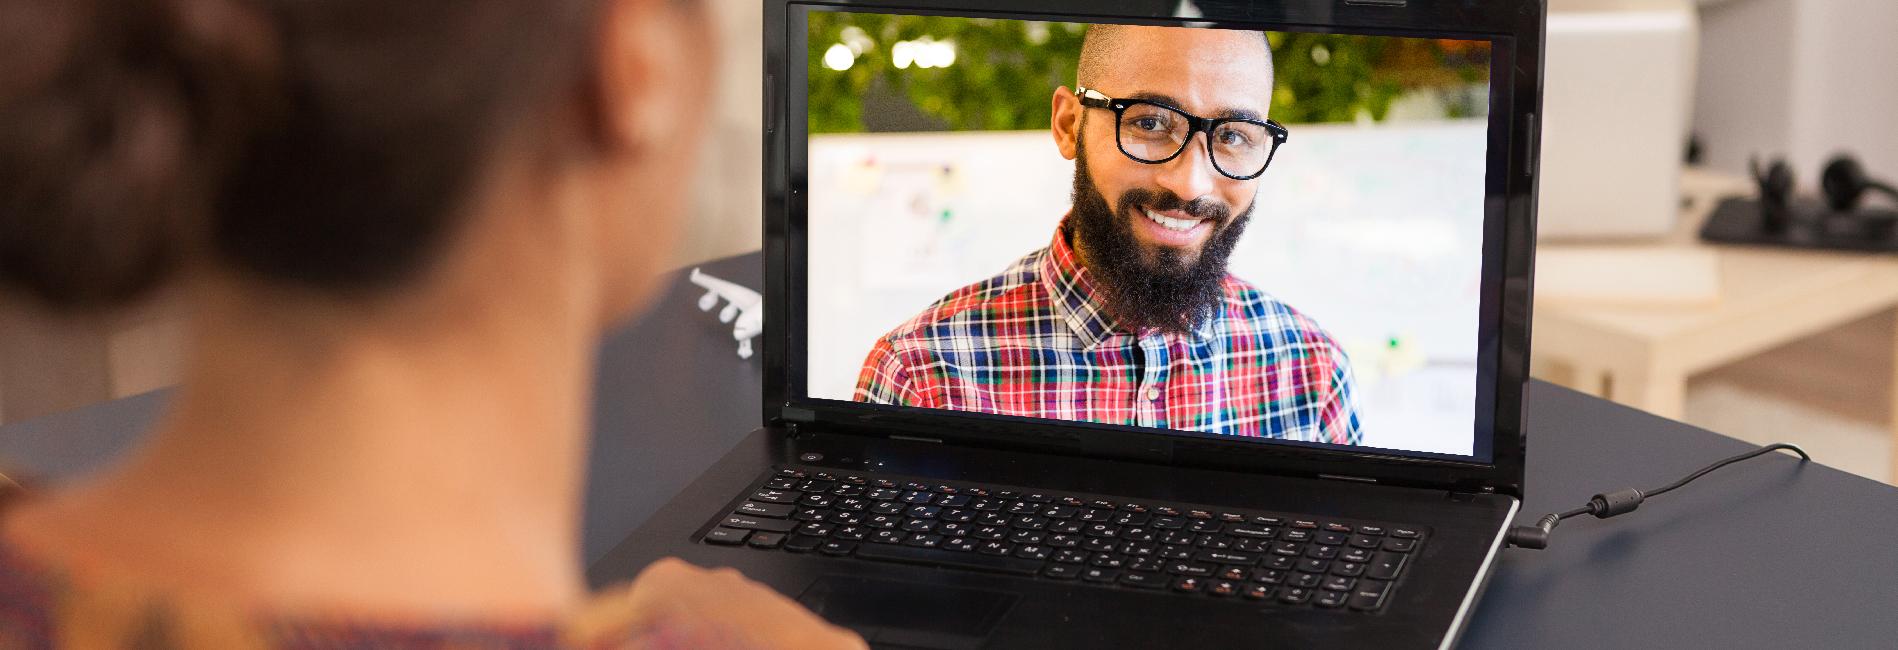 student in computer having interview